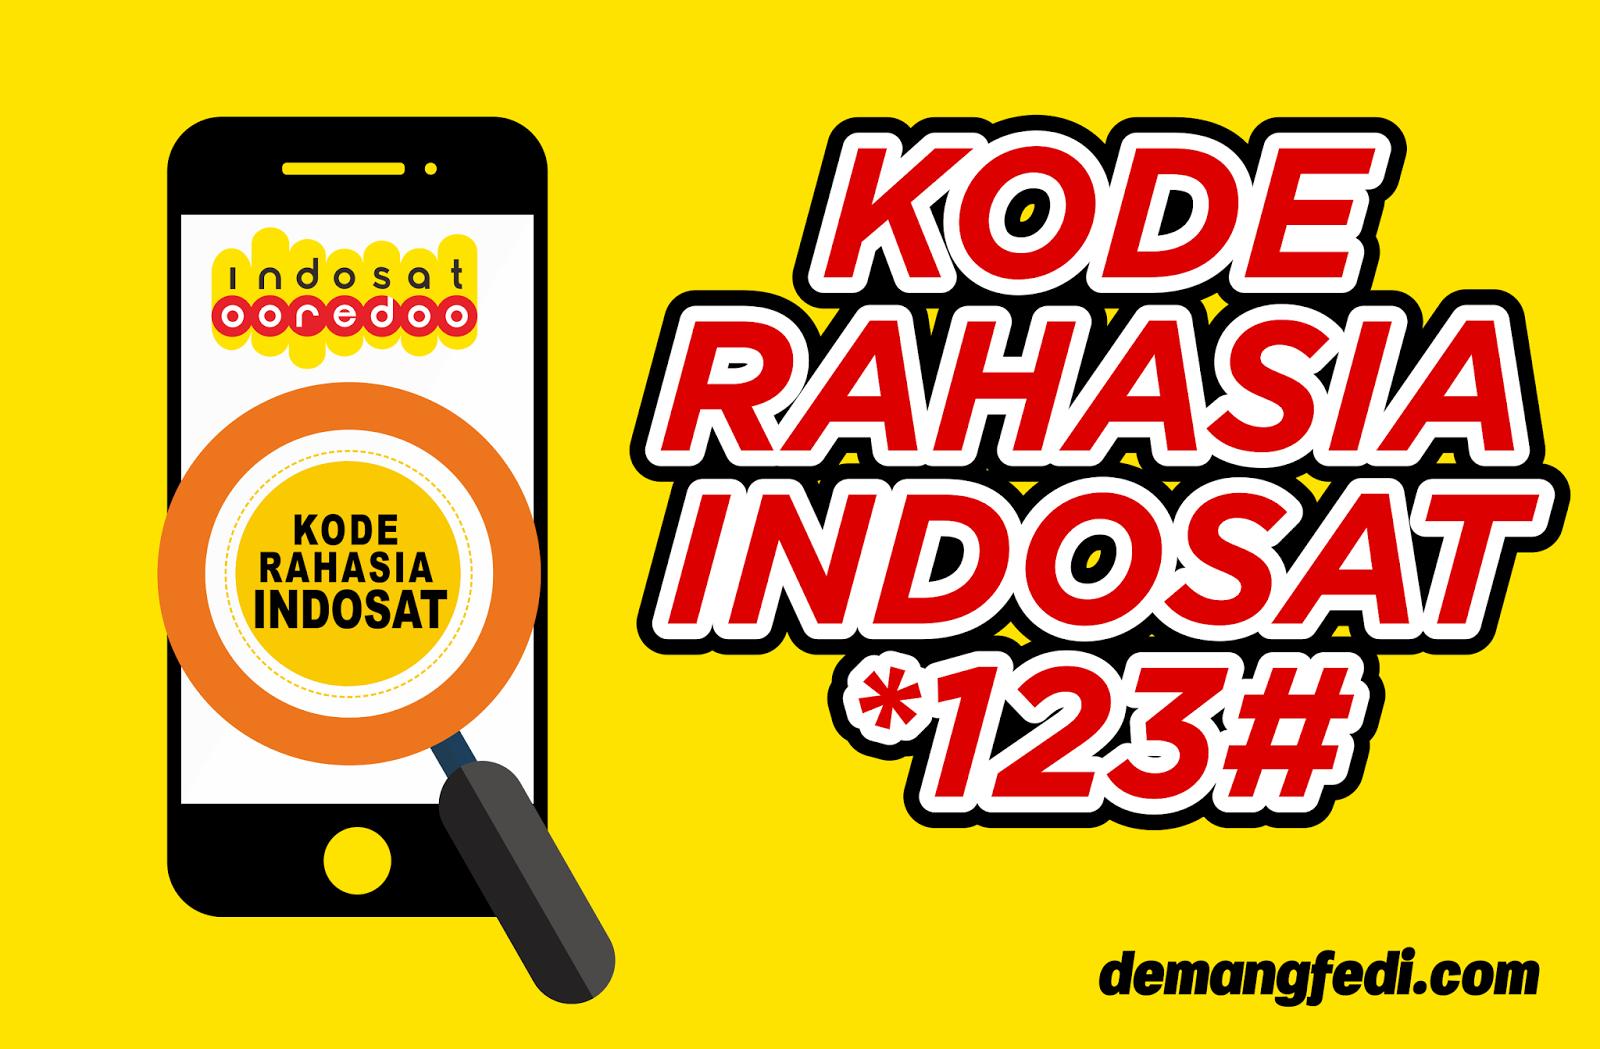 Kode Rahasia Indosat